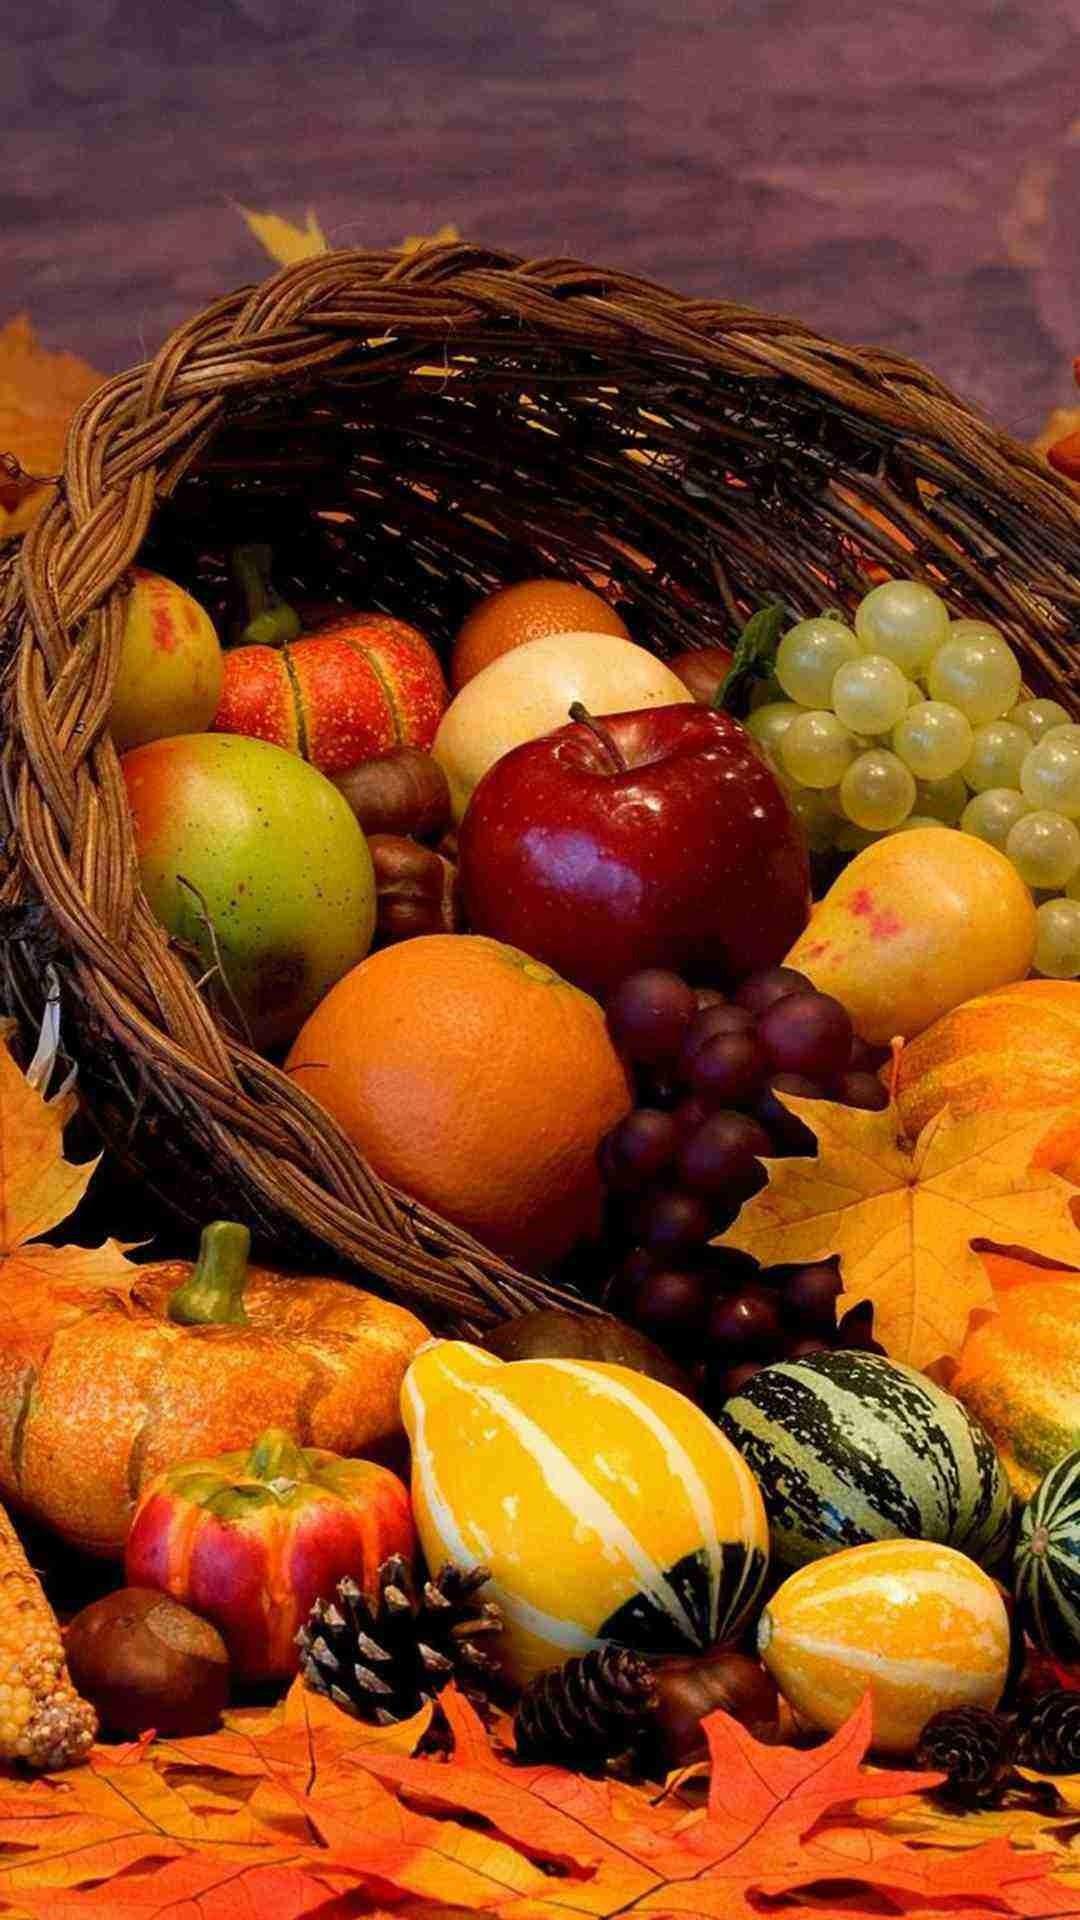 Various Autumn Fruit Harvest 2015 Thanksgiving iPhone 6 Plus Wallpaper –  Pumpkin , Apple, Grape,